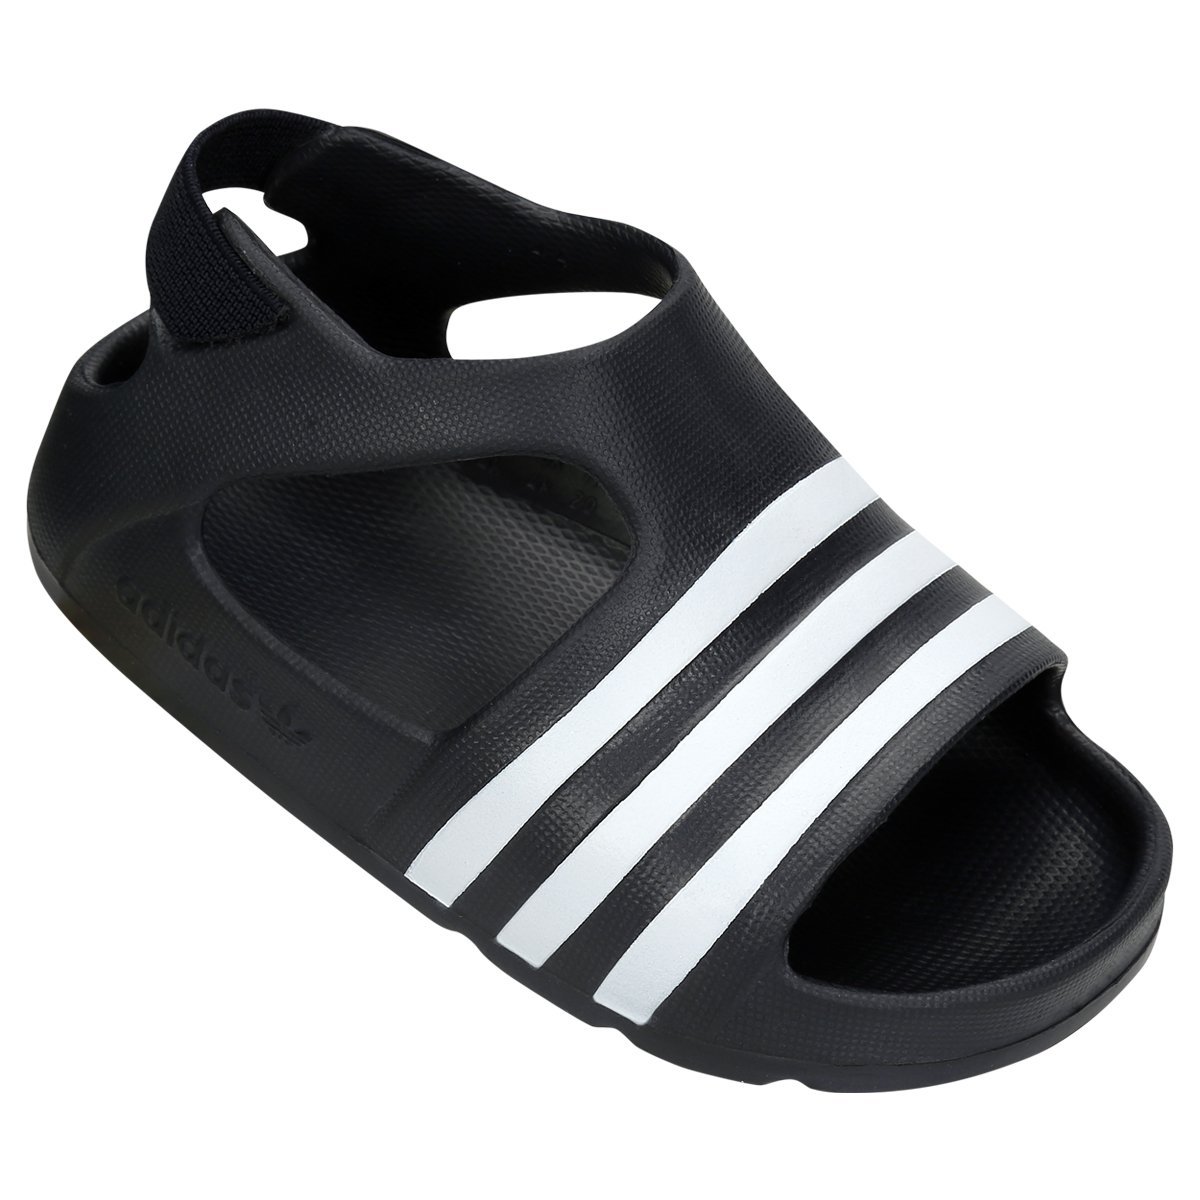 5d4f5eed81a Sandália Adidas Adilette Play 1 Infantil - Preto e Branco adidas adilette  infantil